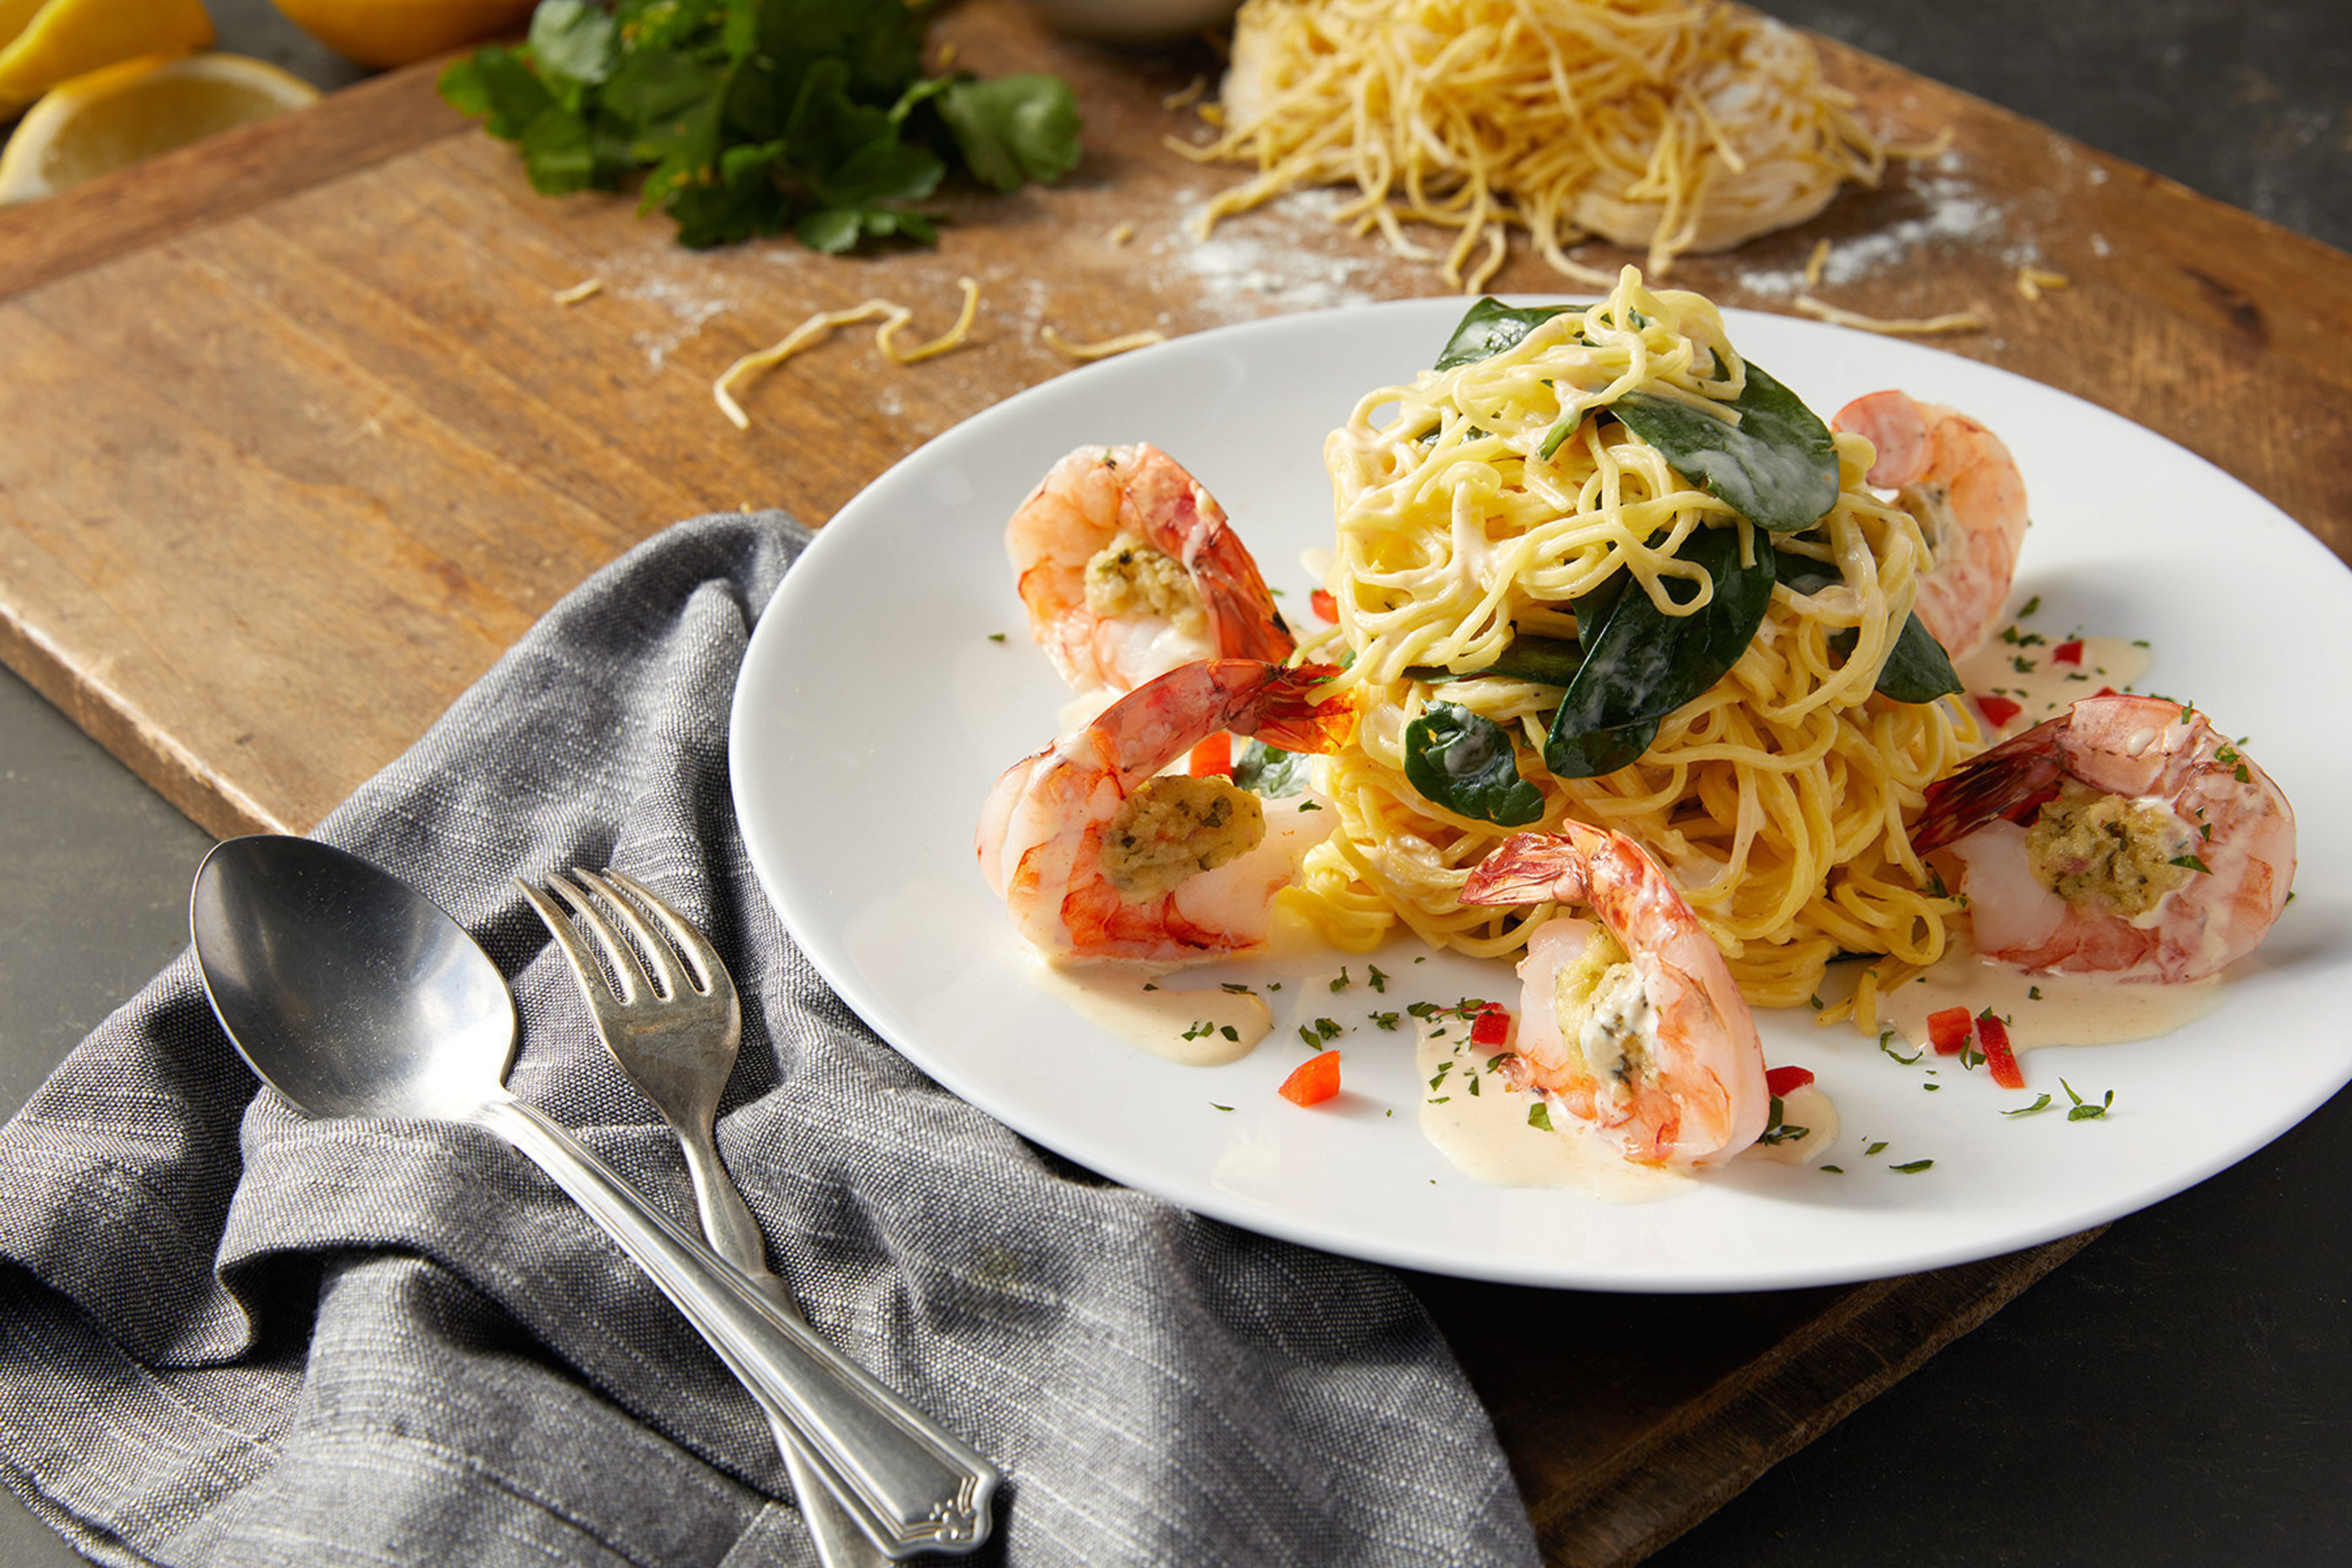 BRAVO! Cucina Italiana's Jumbo Stuffed Shrimp Scampi